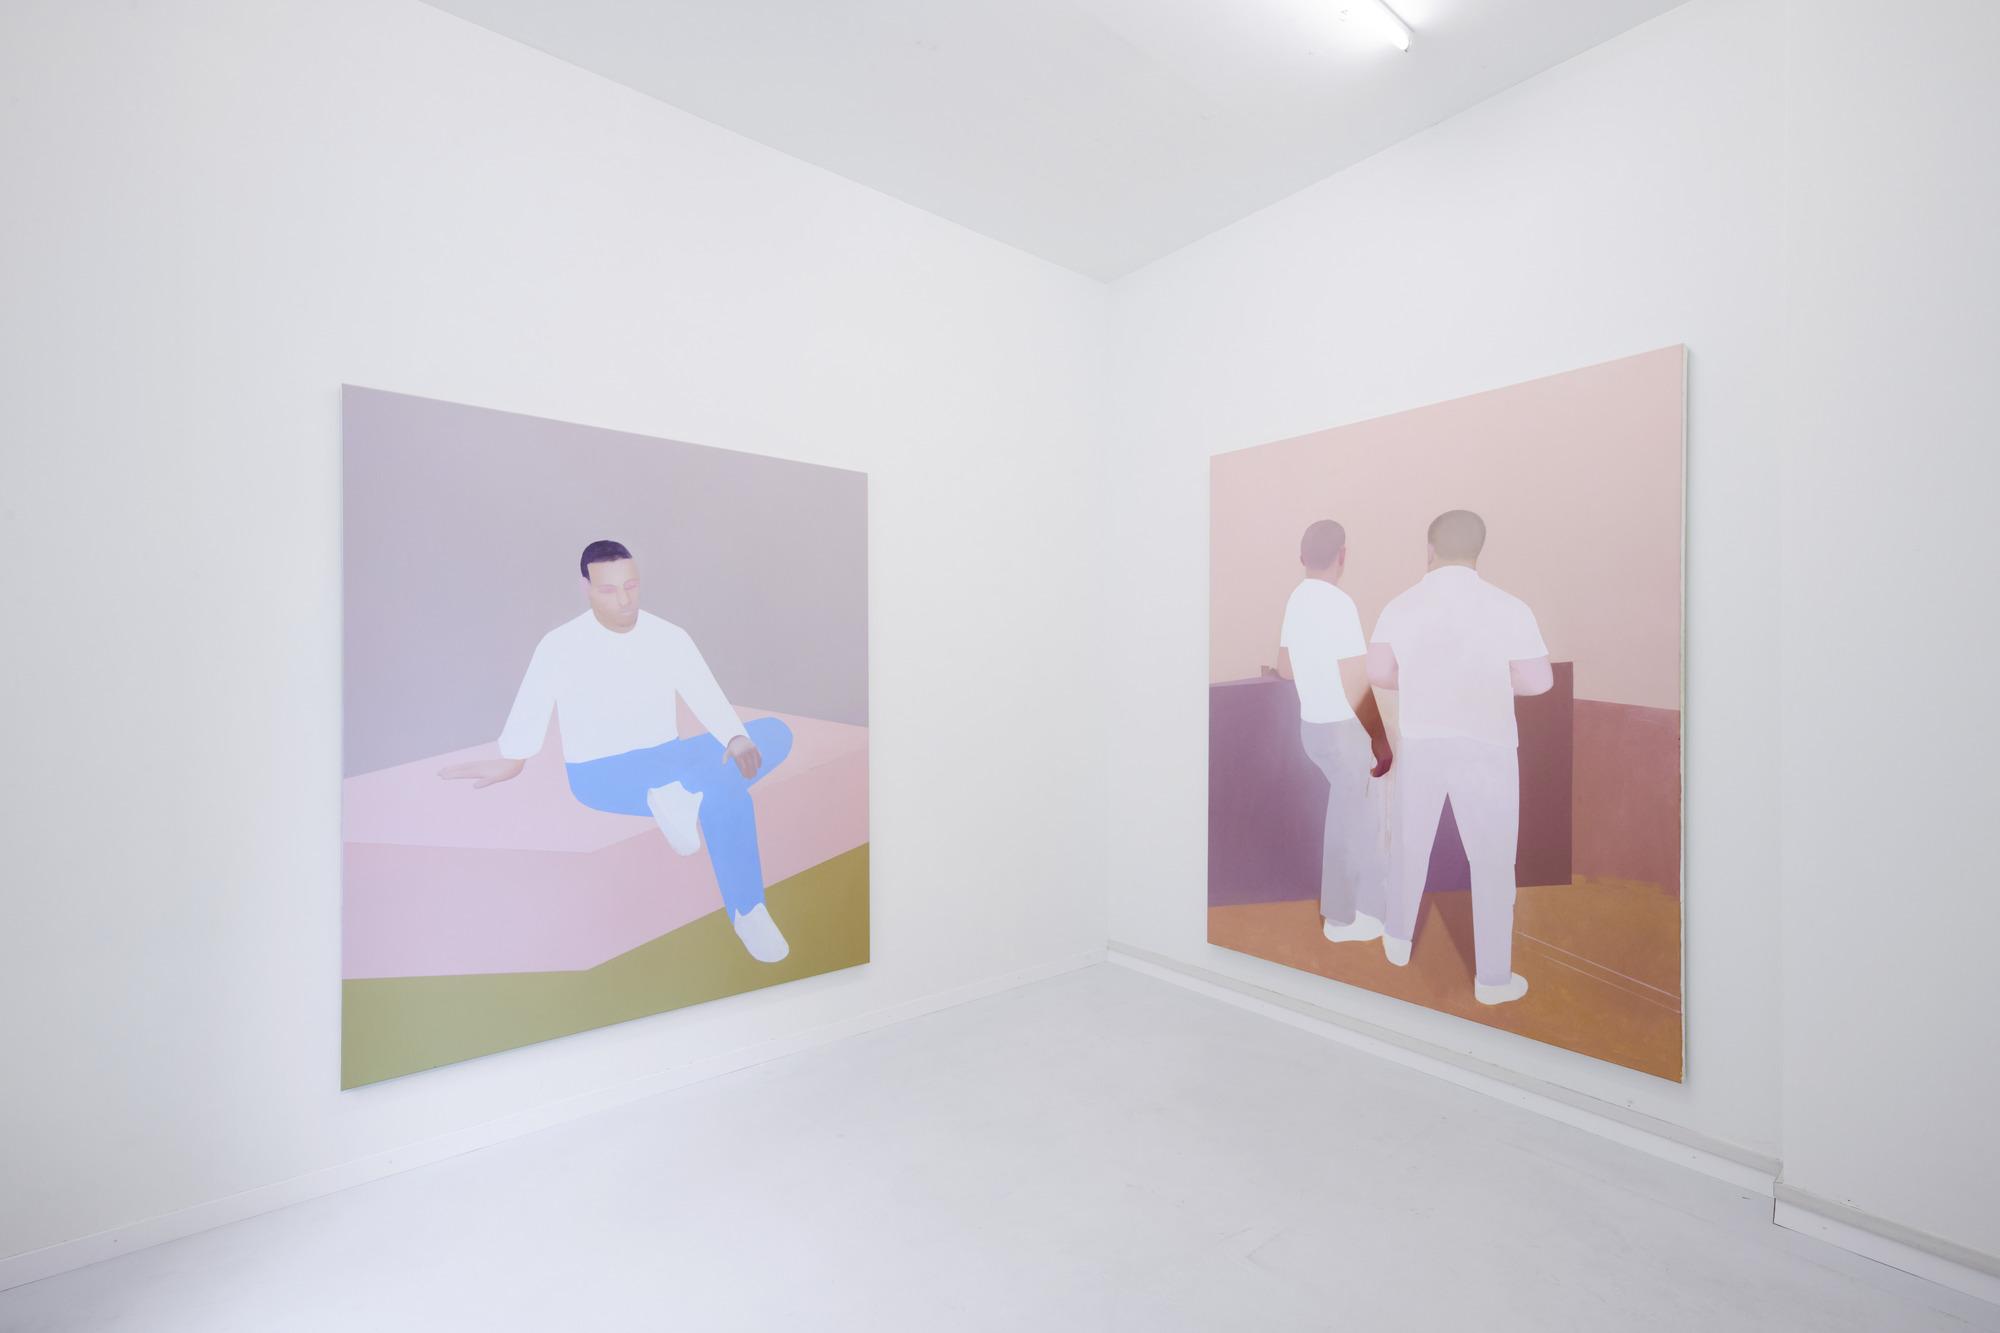 Manuel Stehli, untitled, 2020, 200×170 cm, oil on canvas & untitled, 2019, 220×170 cm, oil on canvas, Courtesy of the artist and Lemoyne